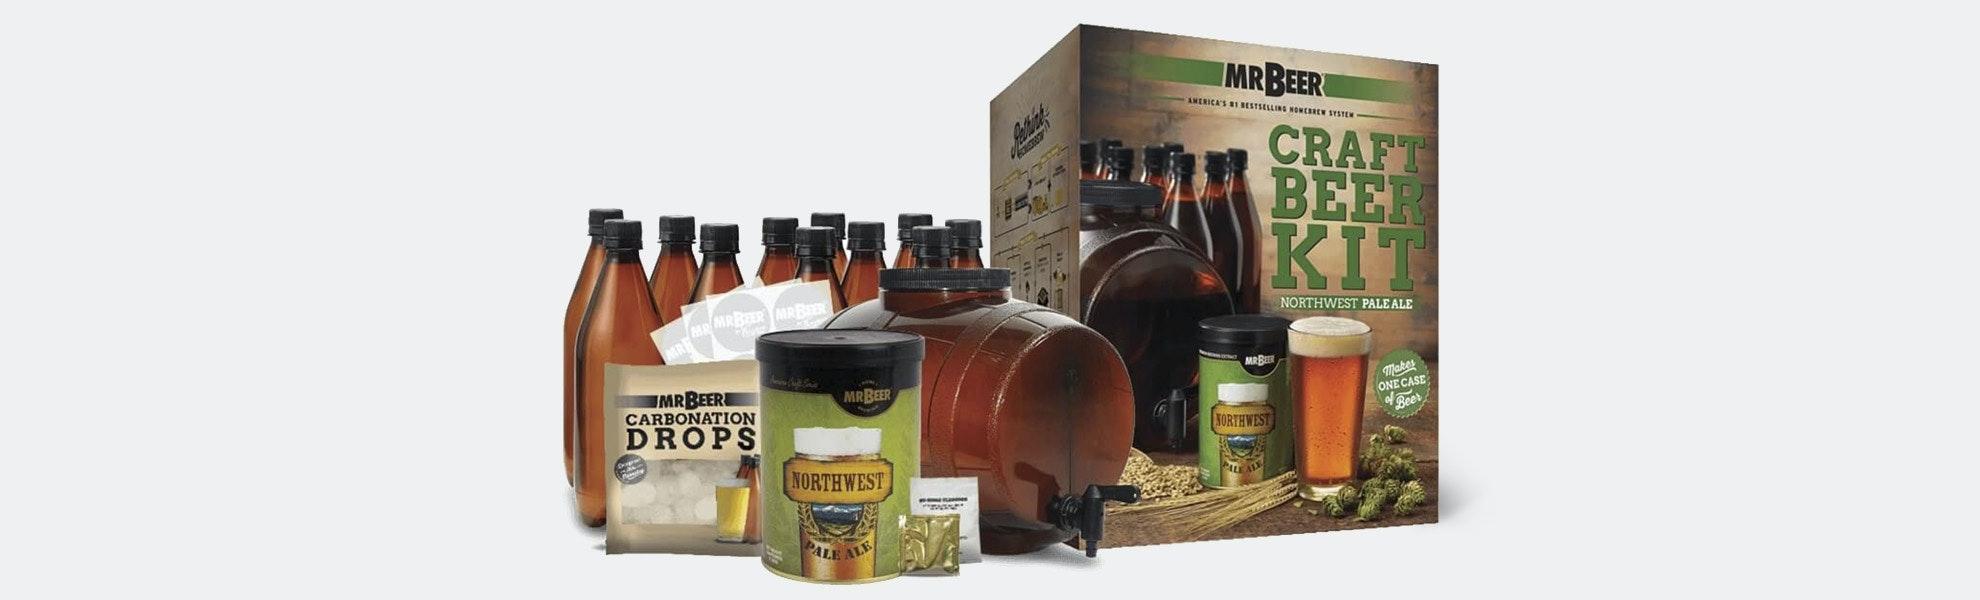 Mr. Beer Complete Craft Brewing Kits